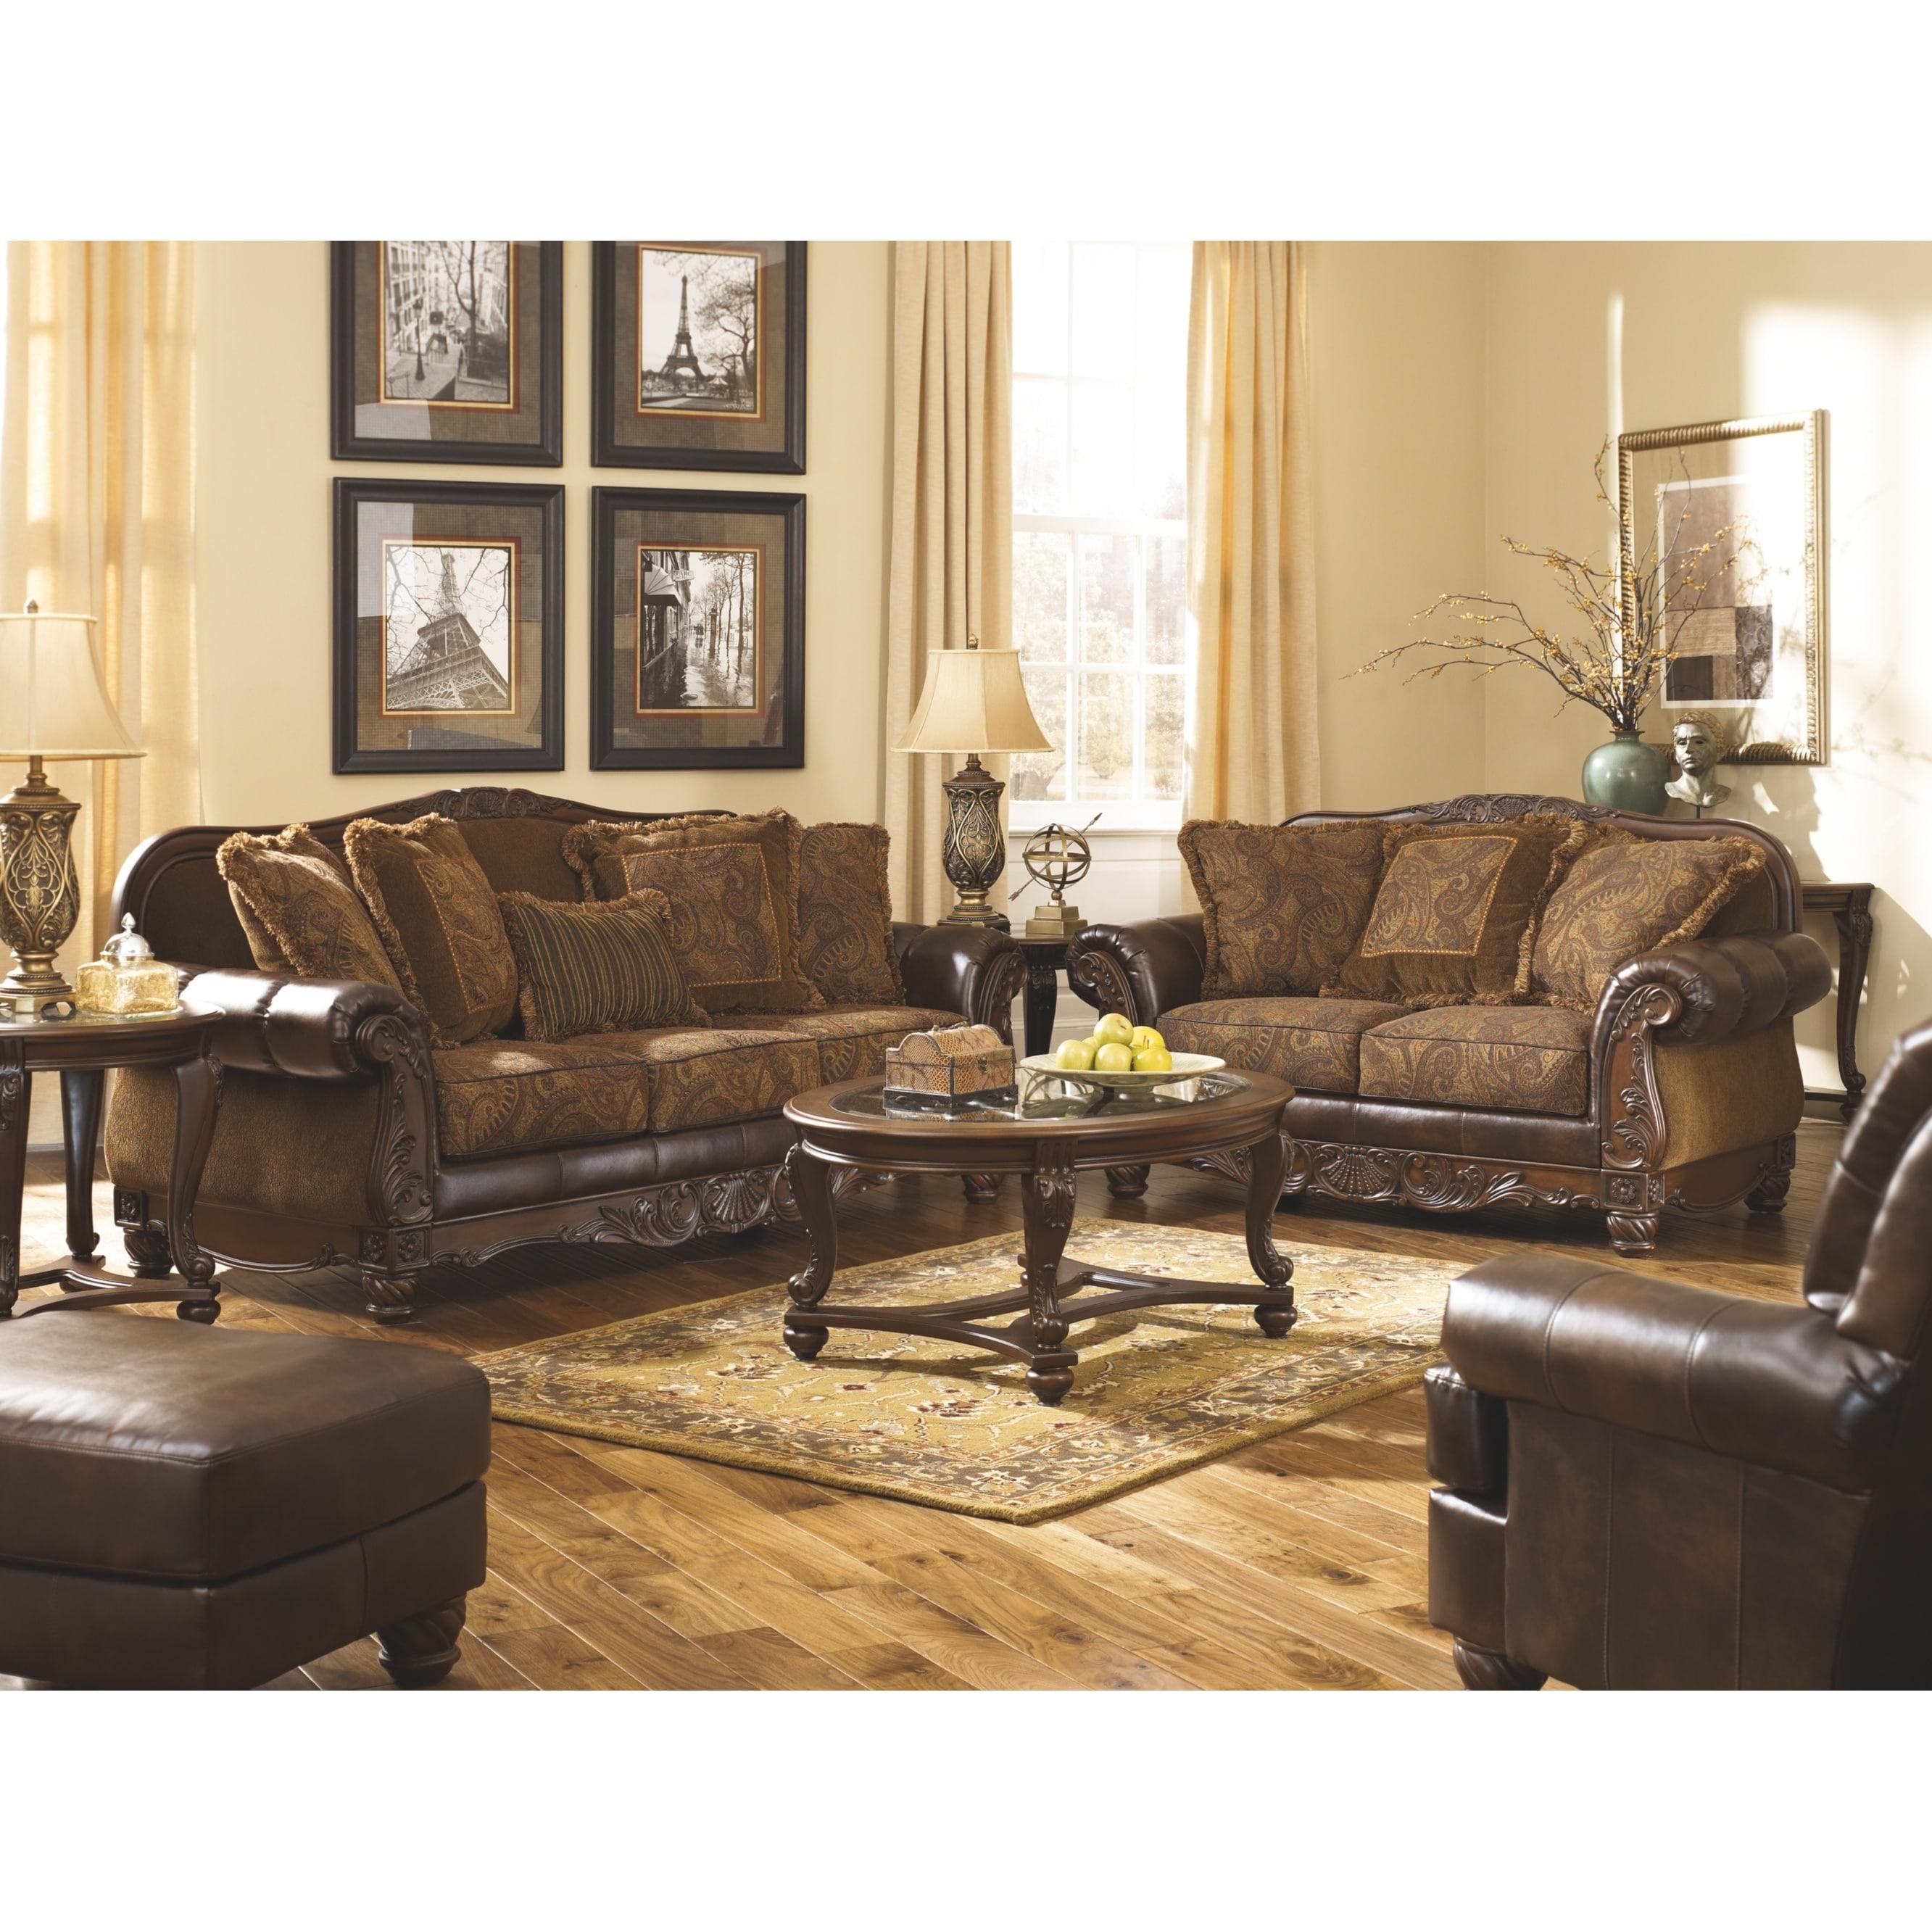 Incredible Fresco Faux Leather Antique Style Accent Chair Creativecarmelina Interior Chair Design Creativecarmelinacom